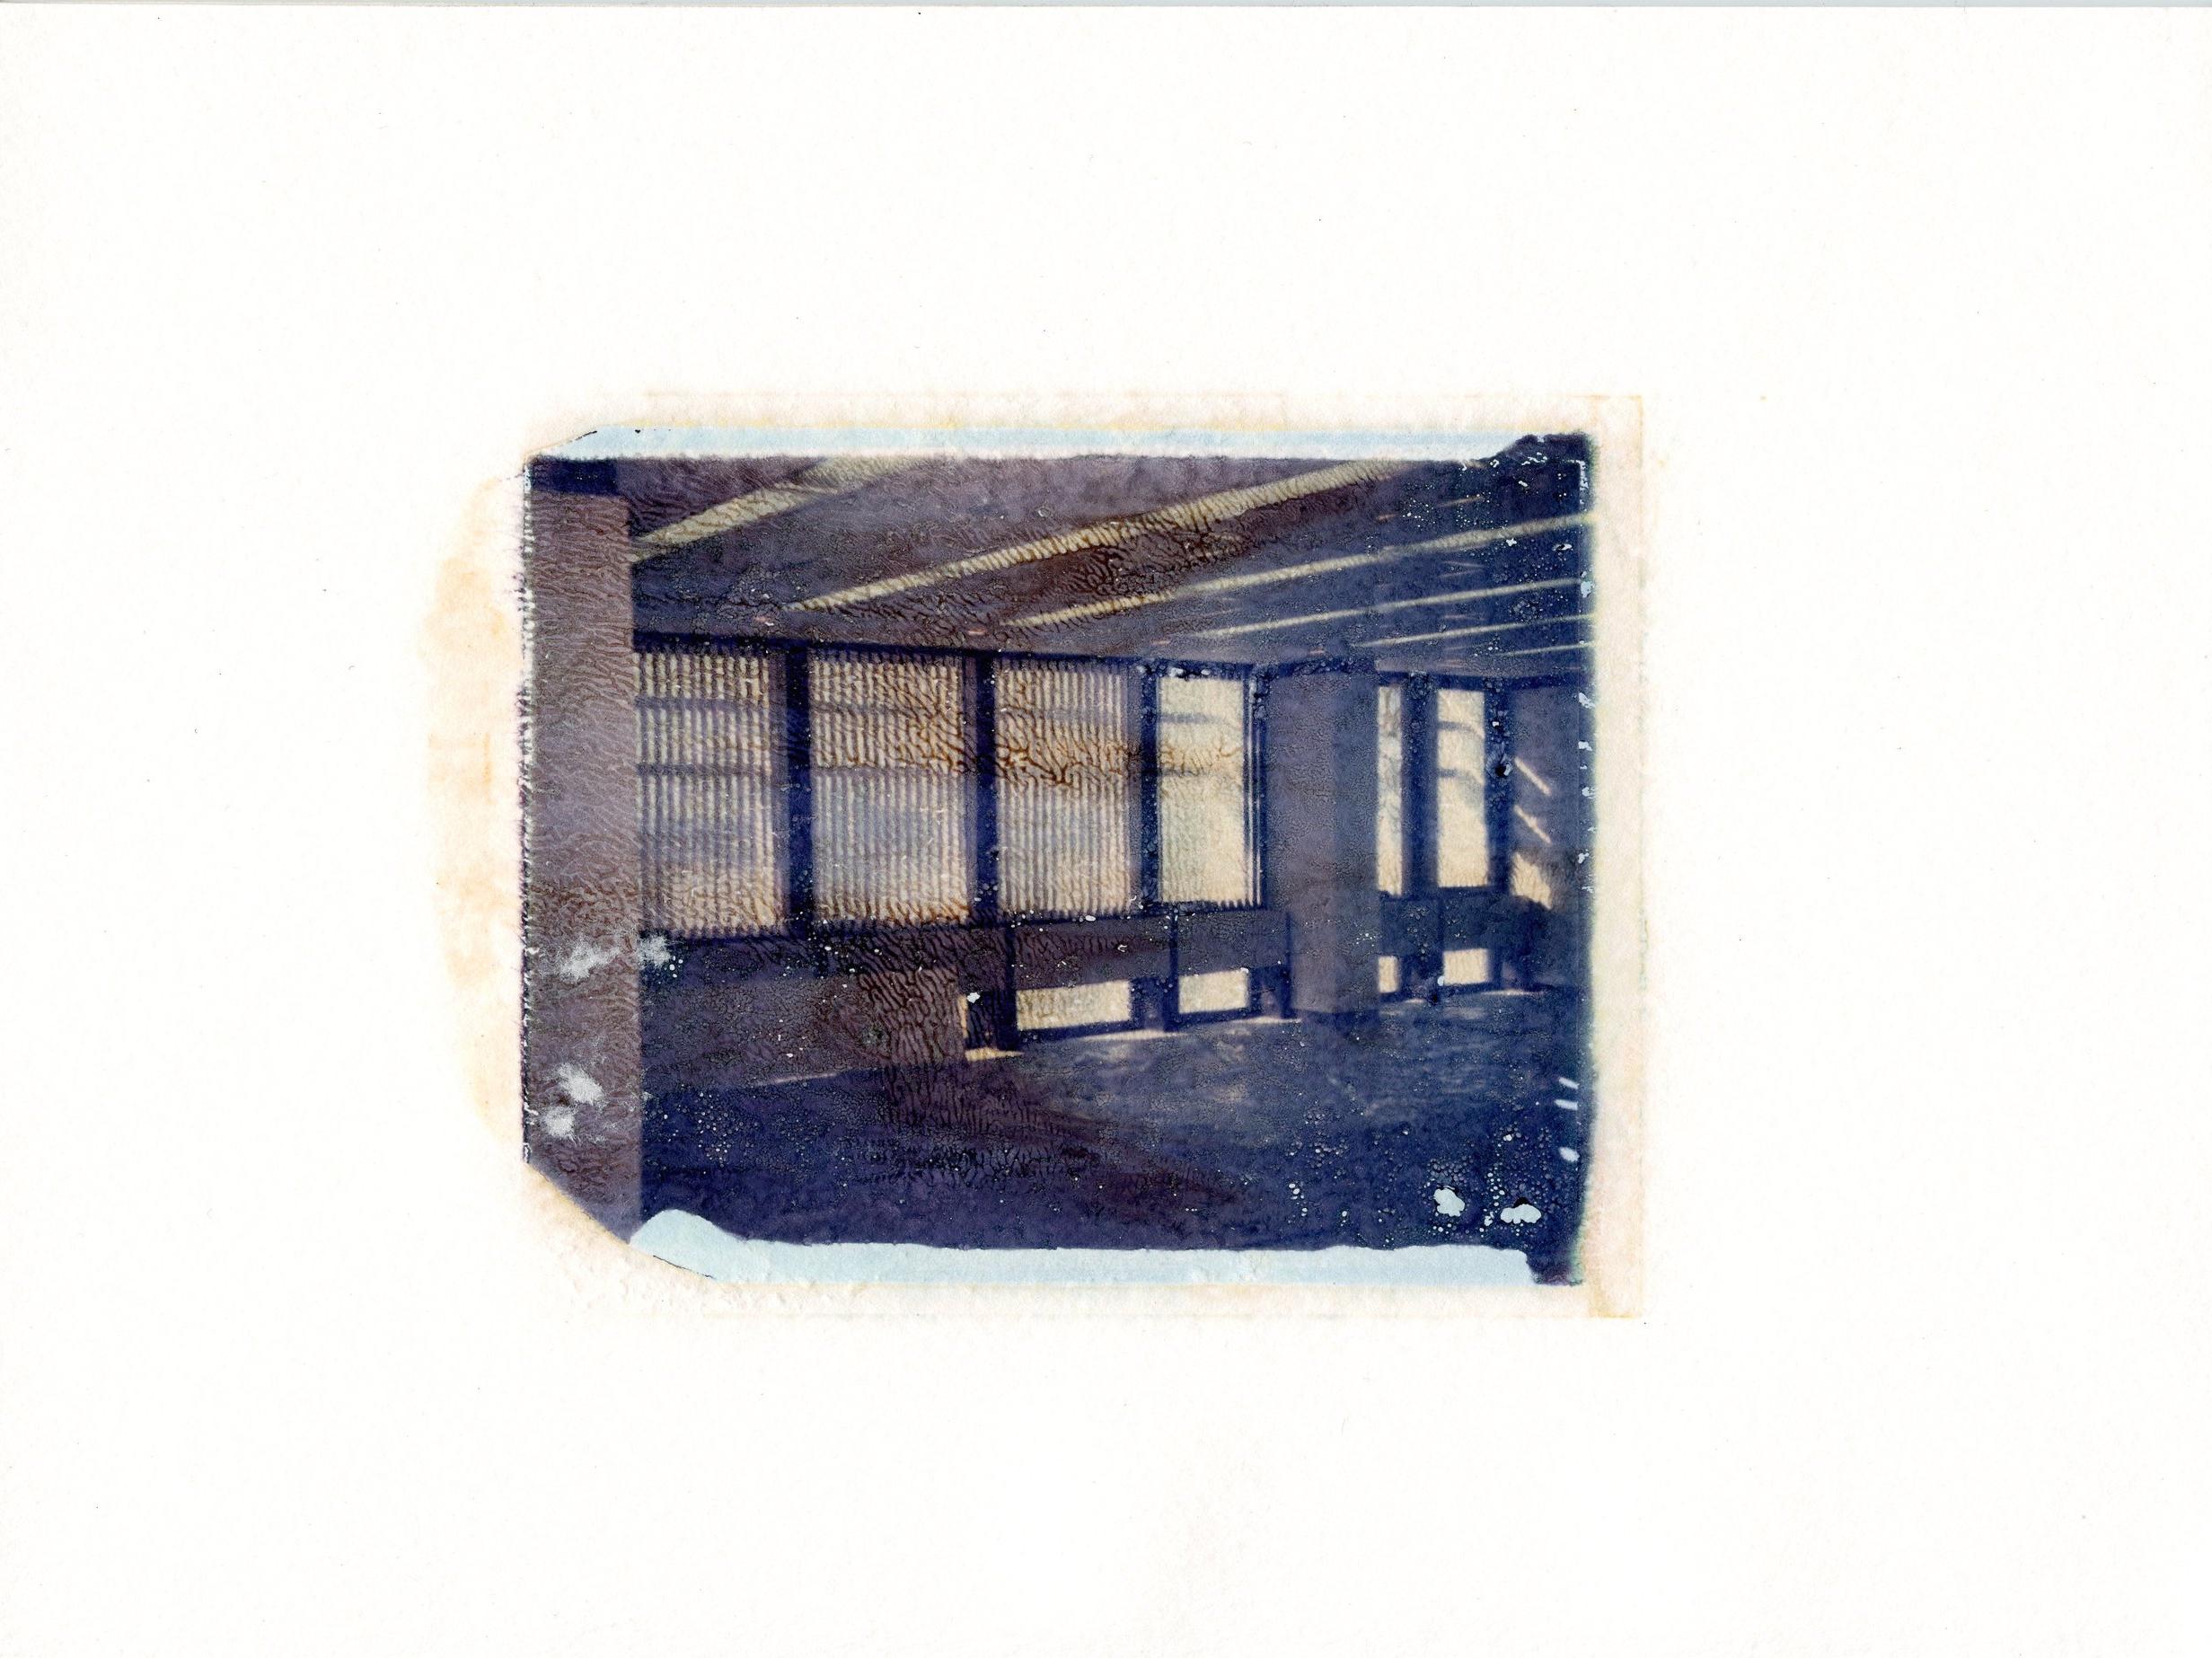 polaroid scans 006.jpg